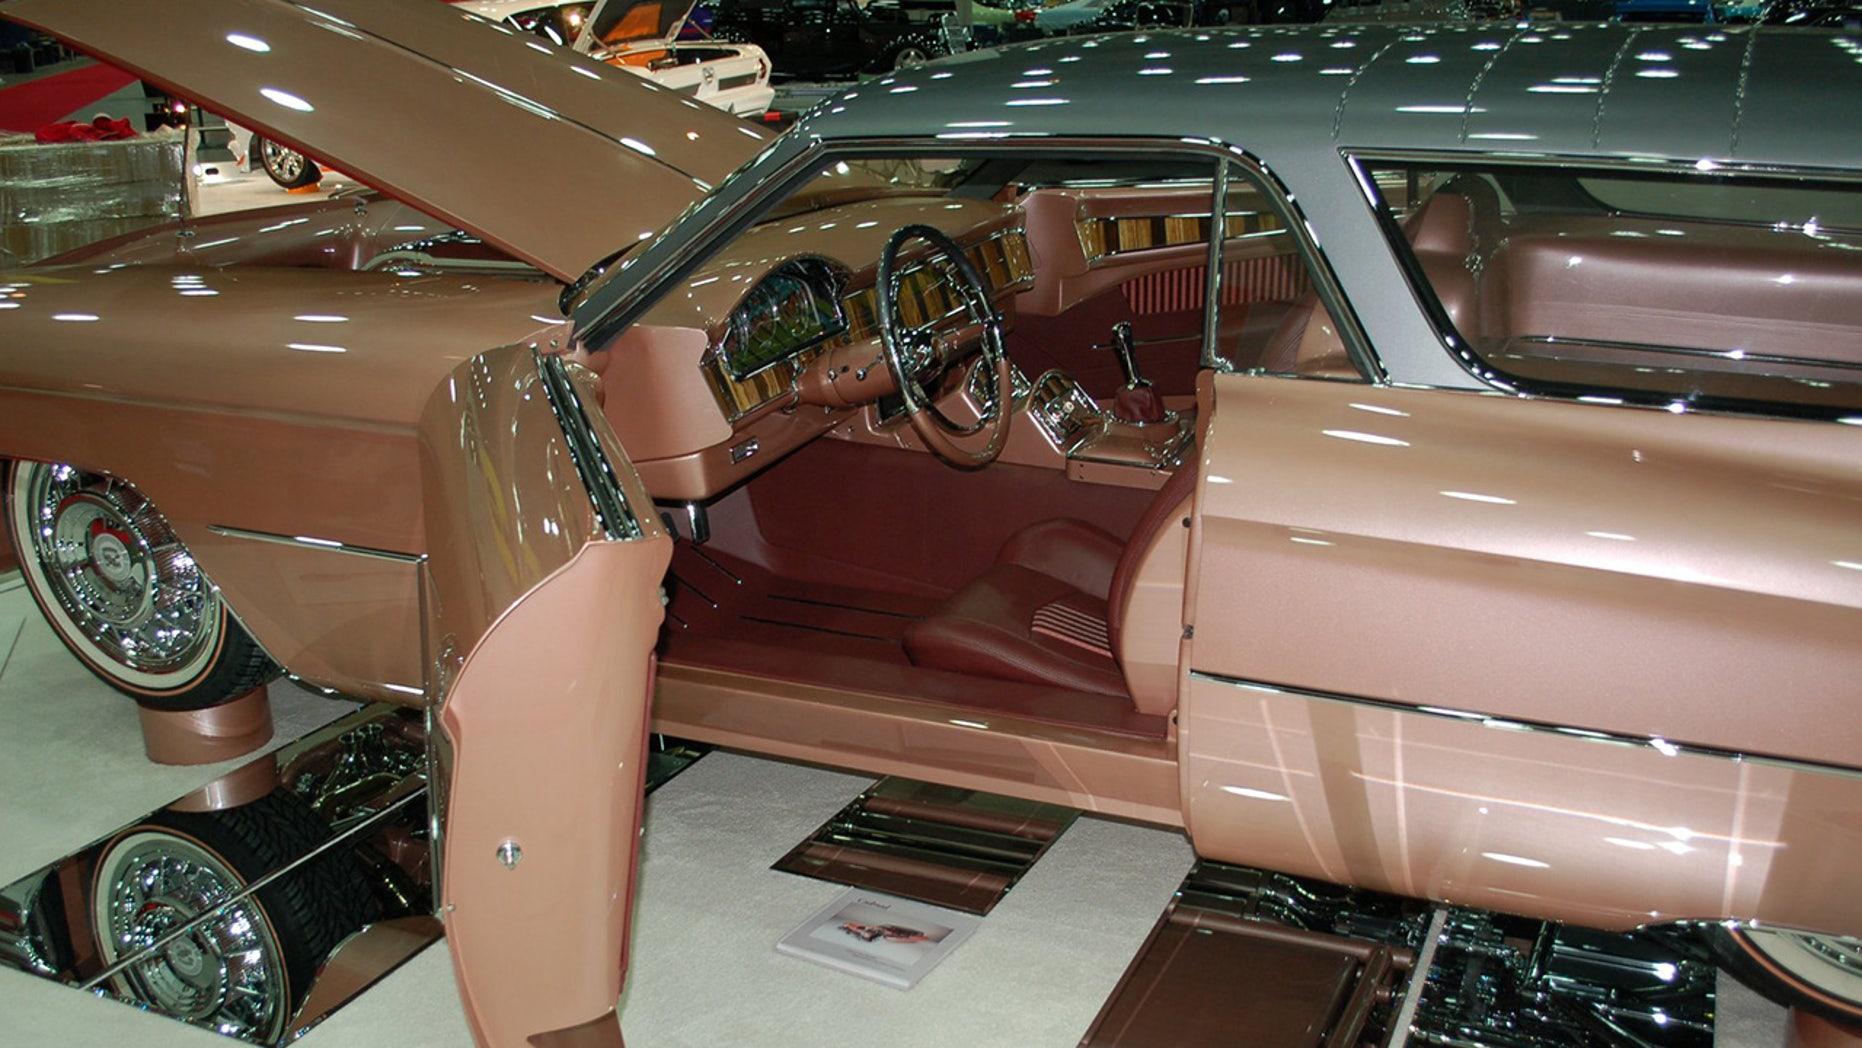 1959 Cadillac CadMAd interior